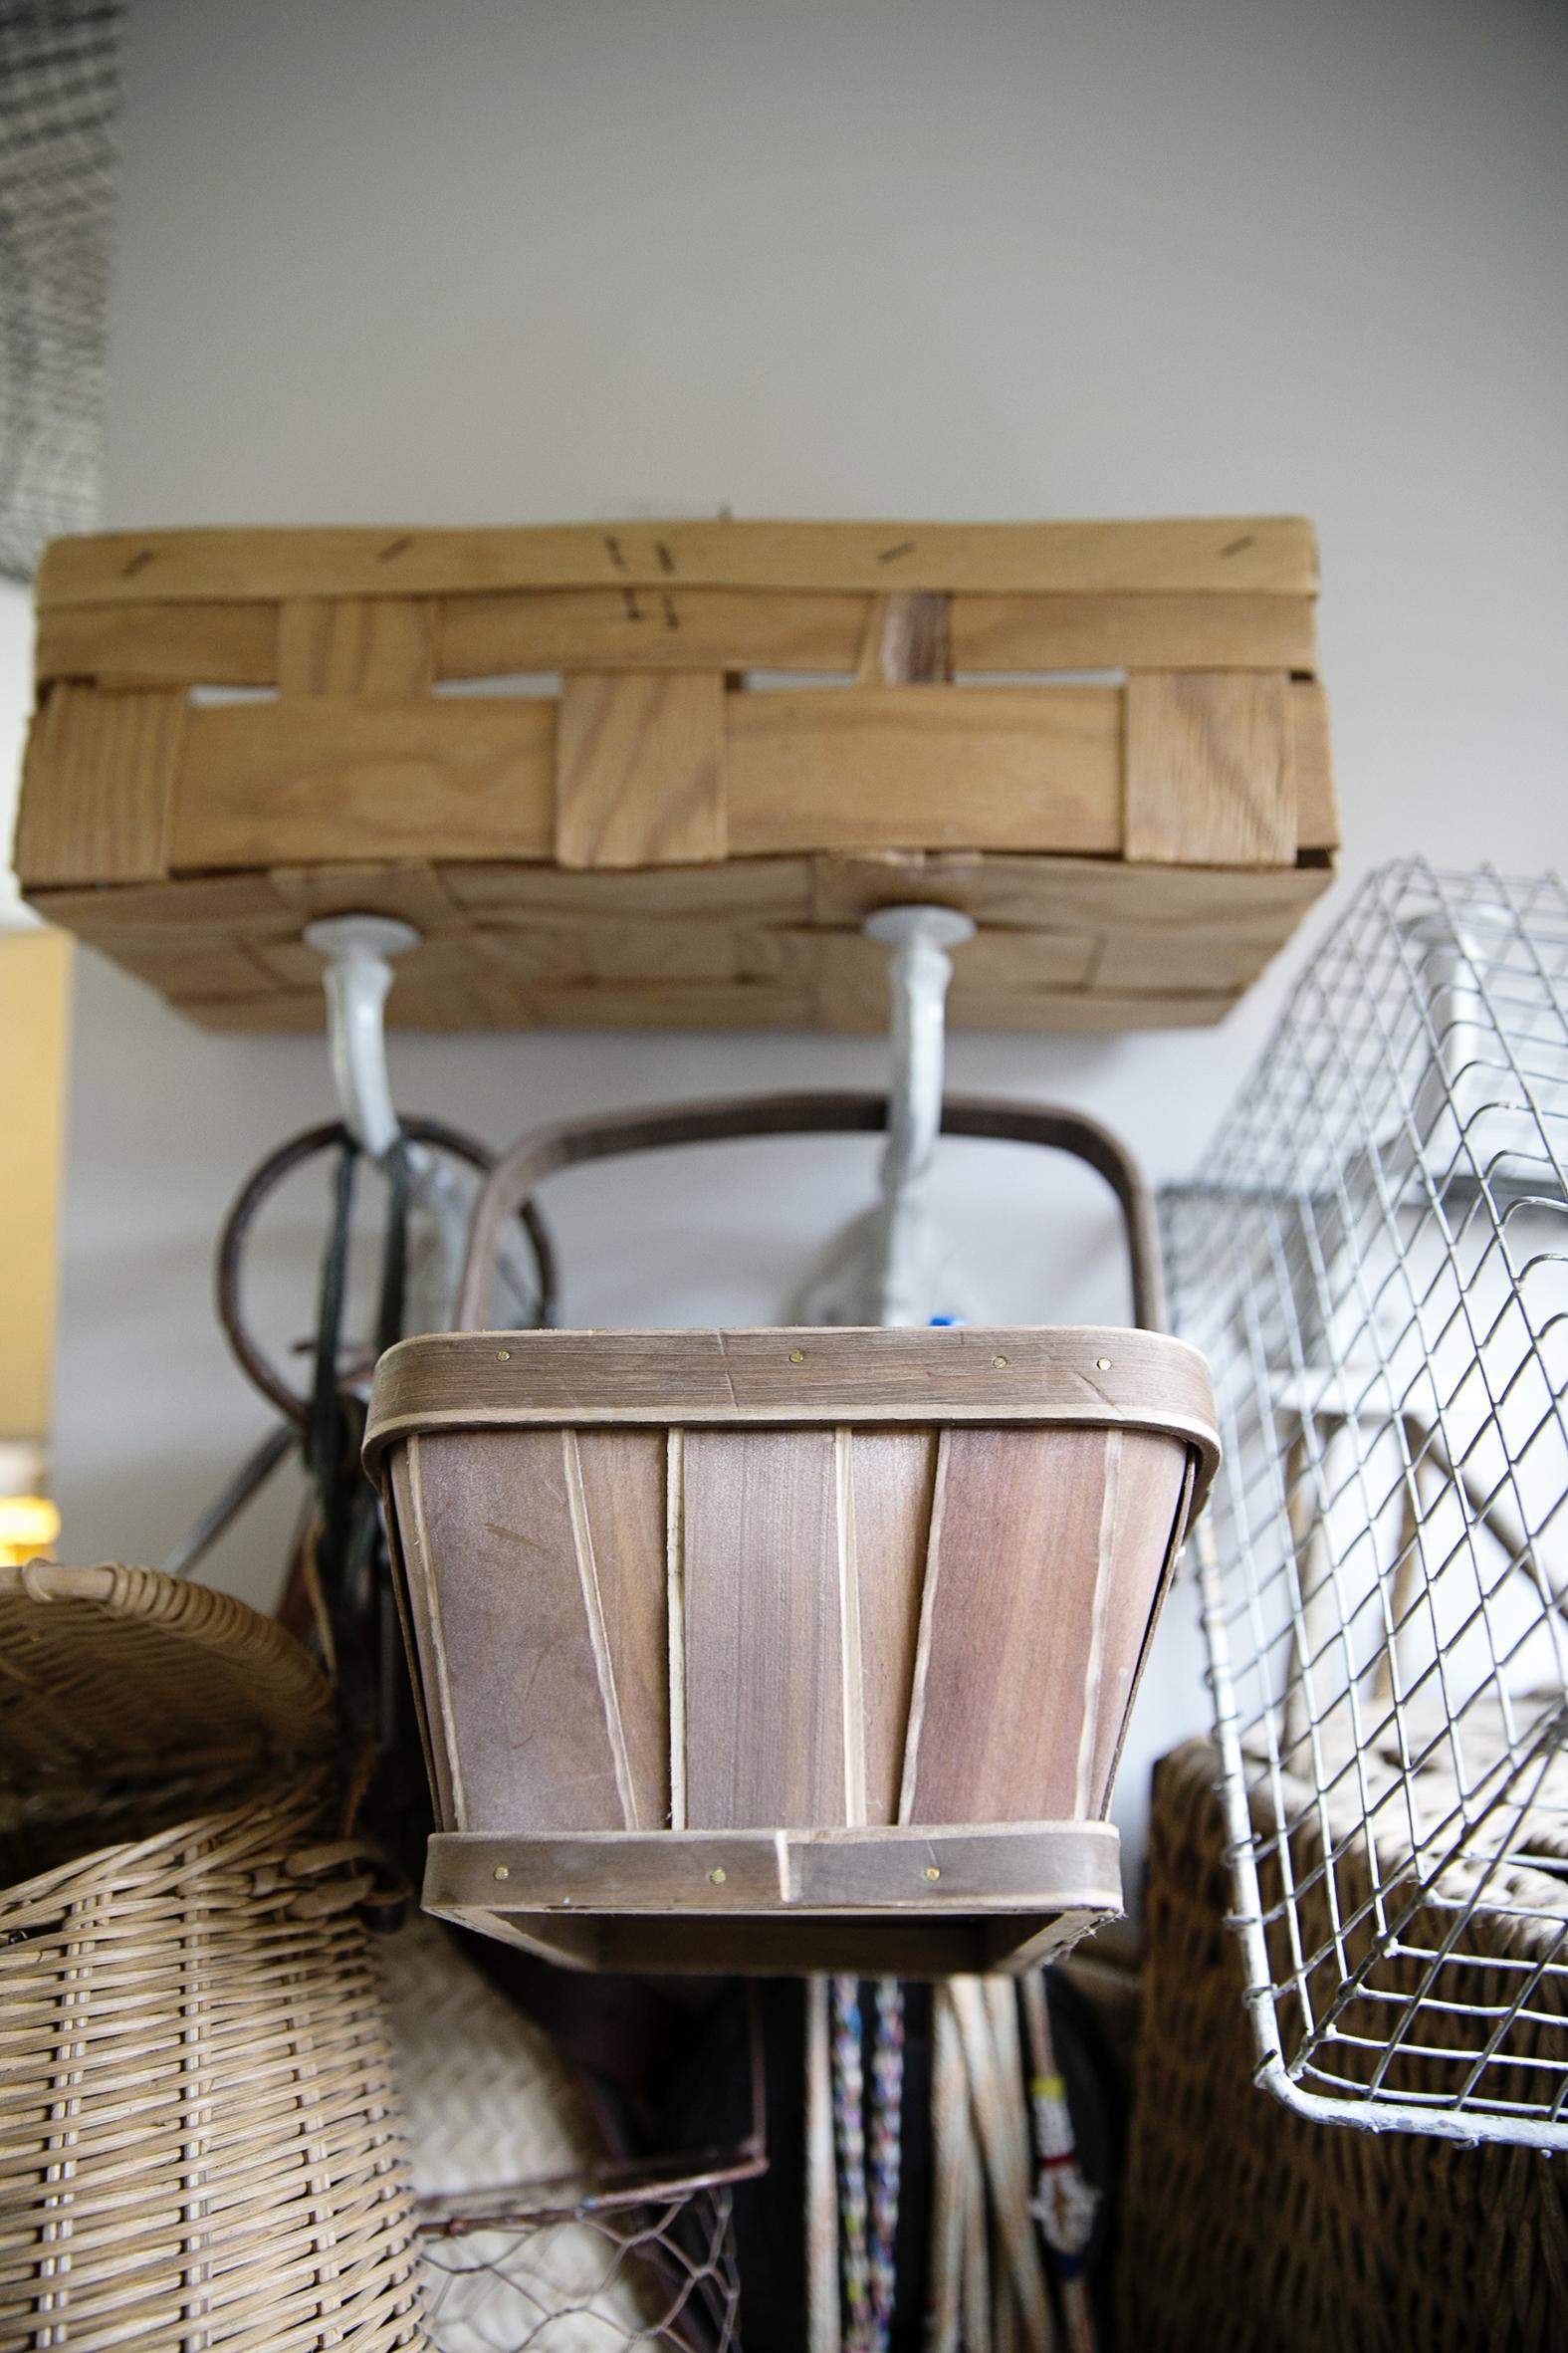 Baskets 036 copy.jpg